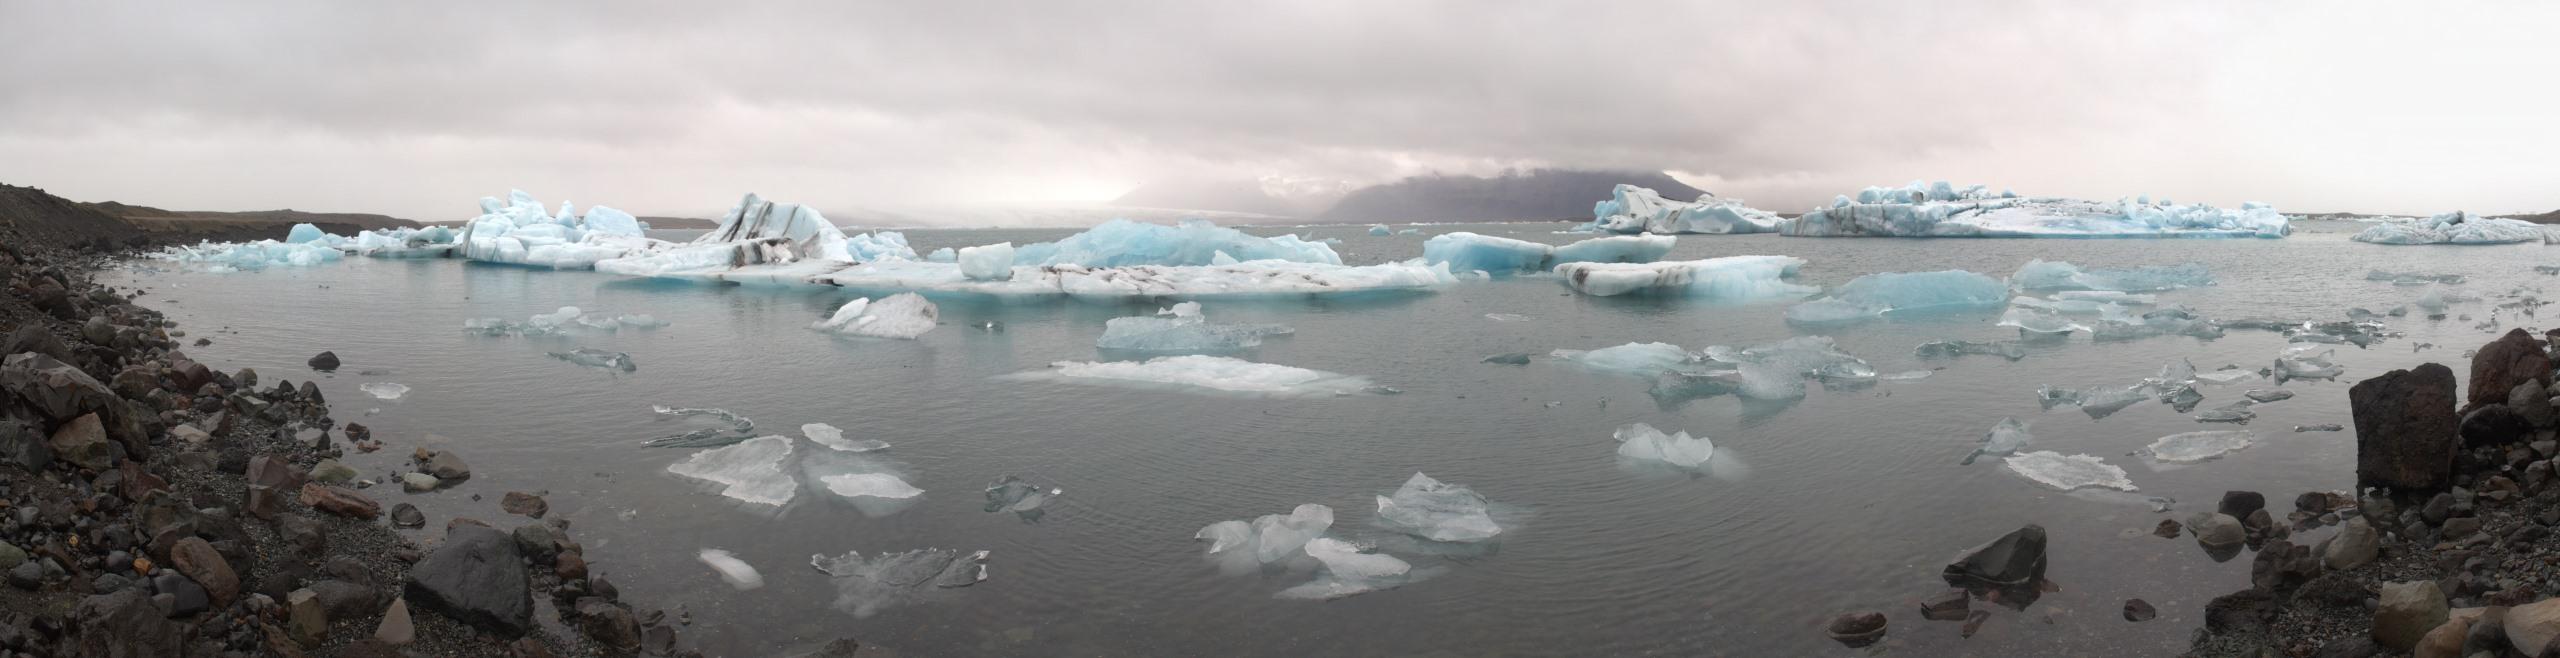 2016-island-vatnajokull